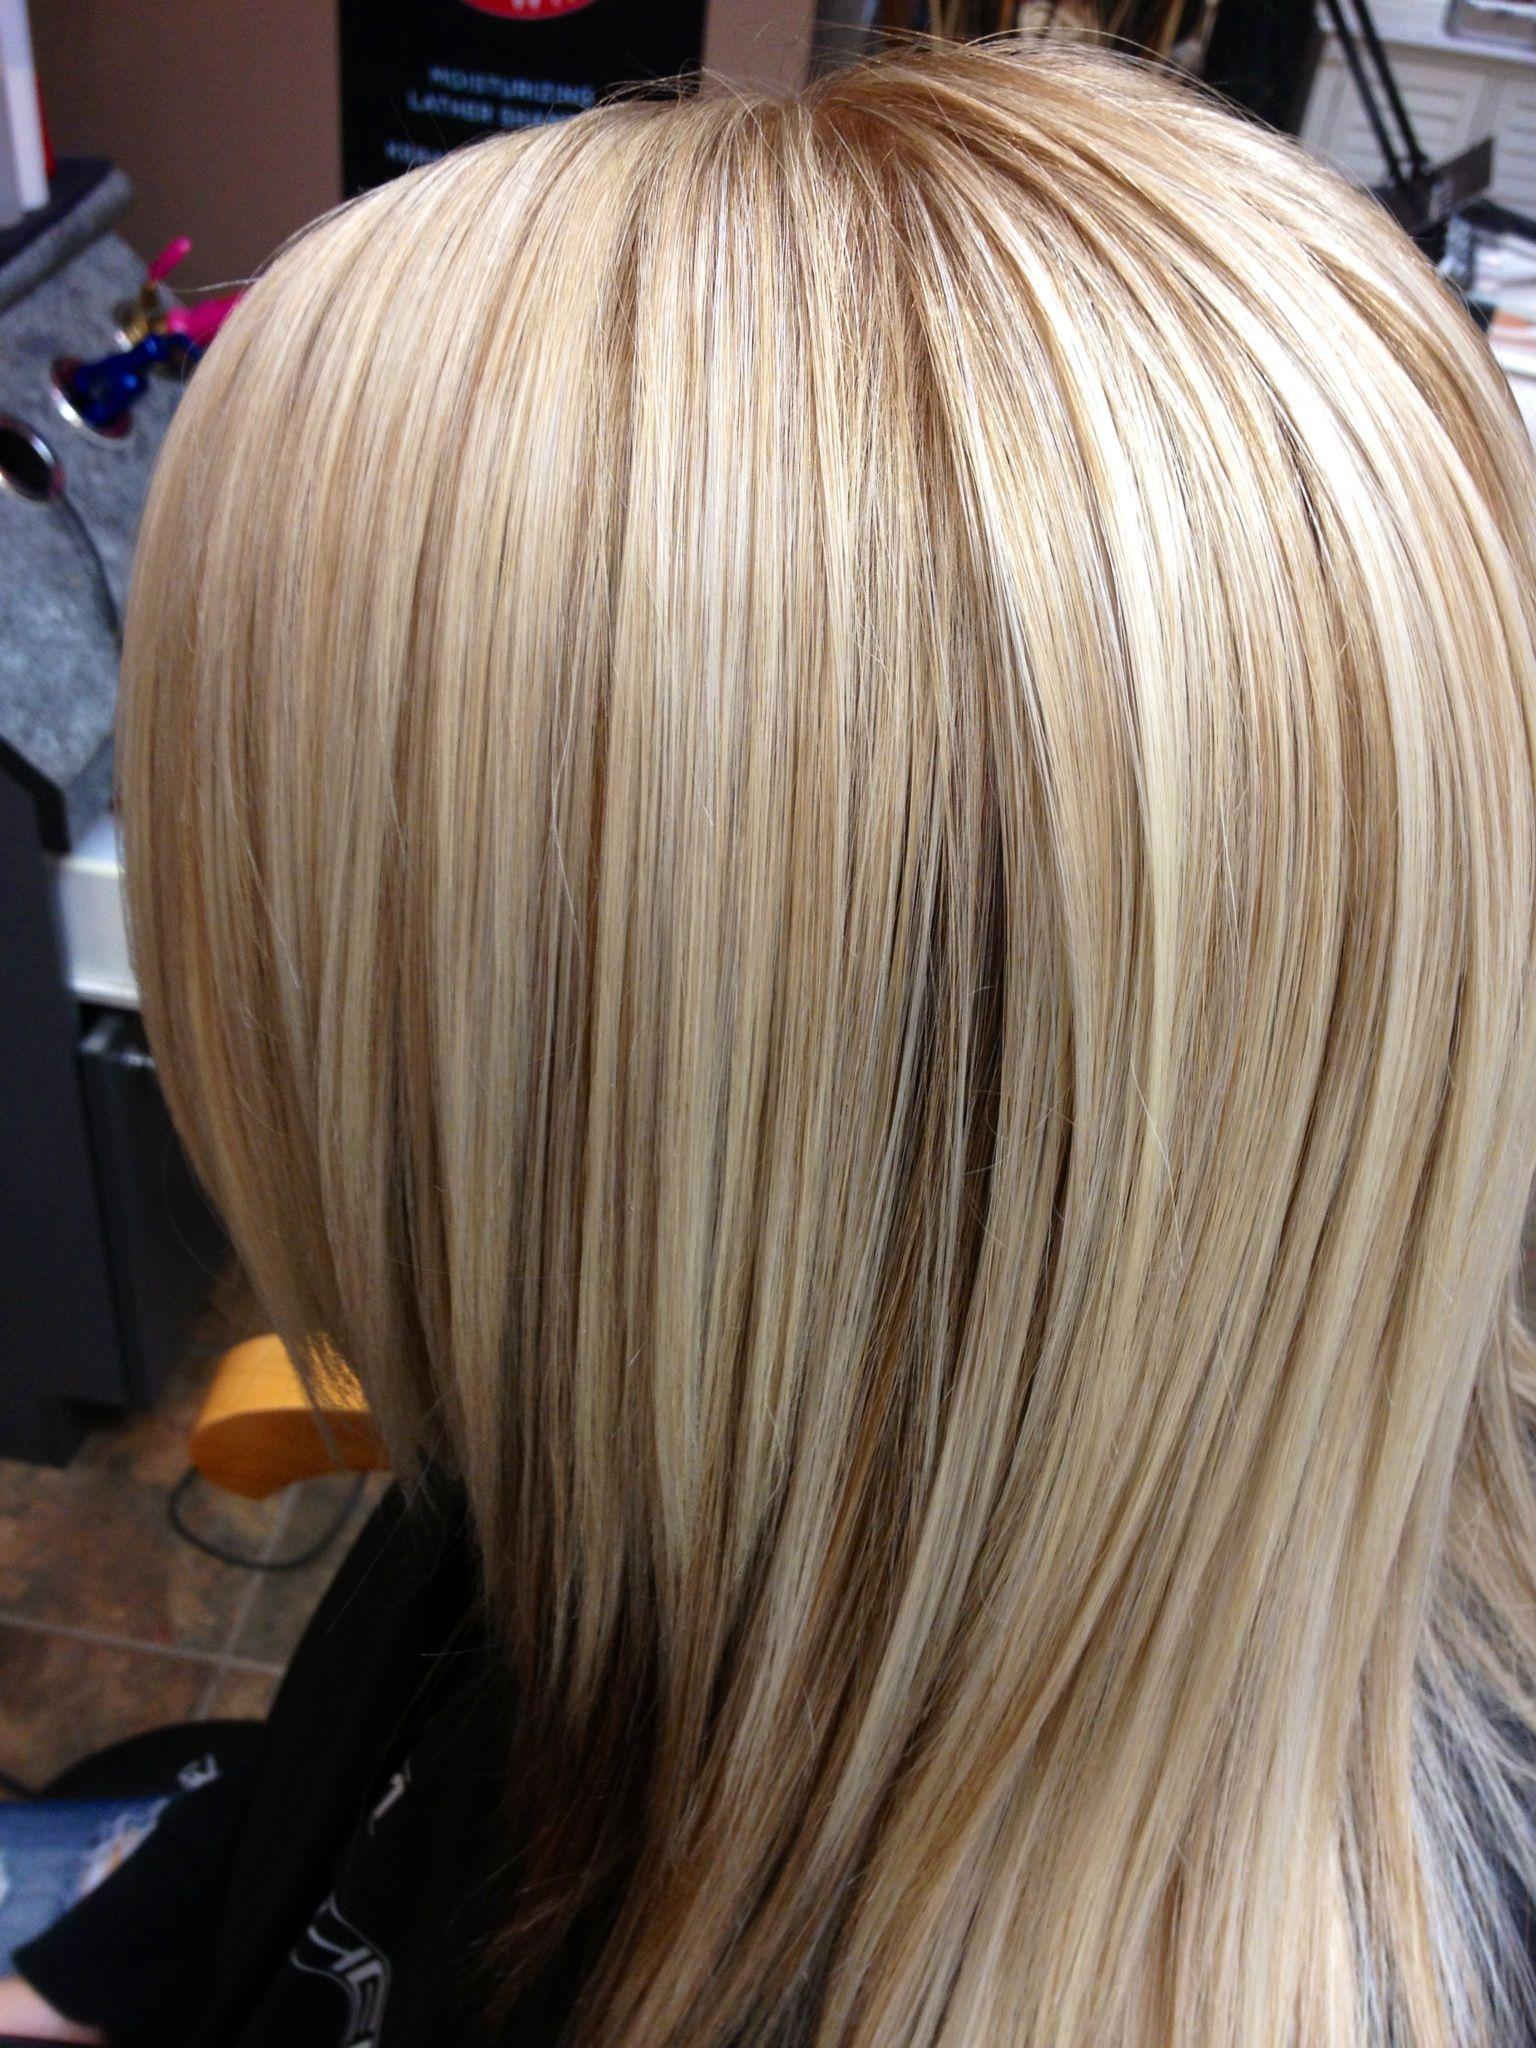 Lowlights And Blonde Bangs Highlights Ash